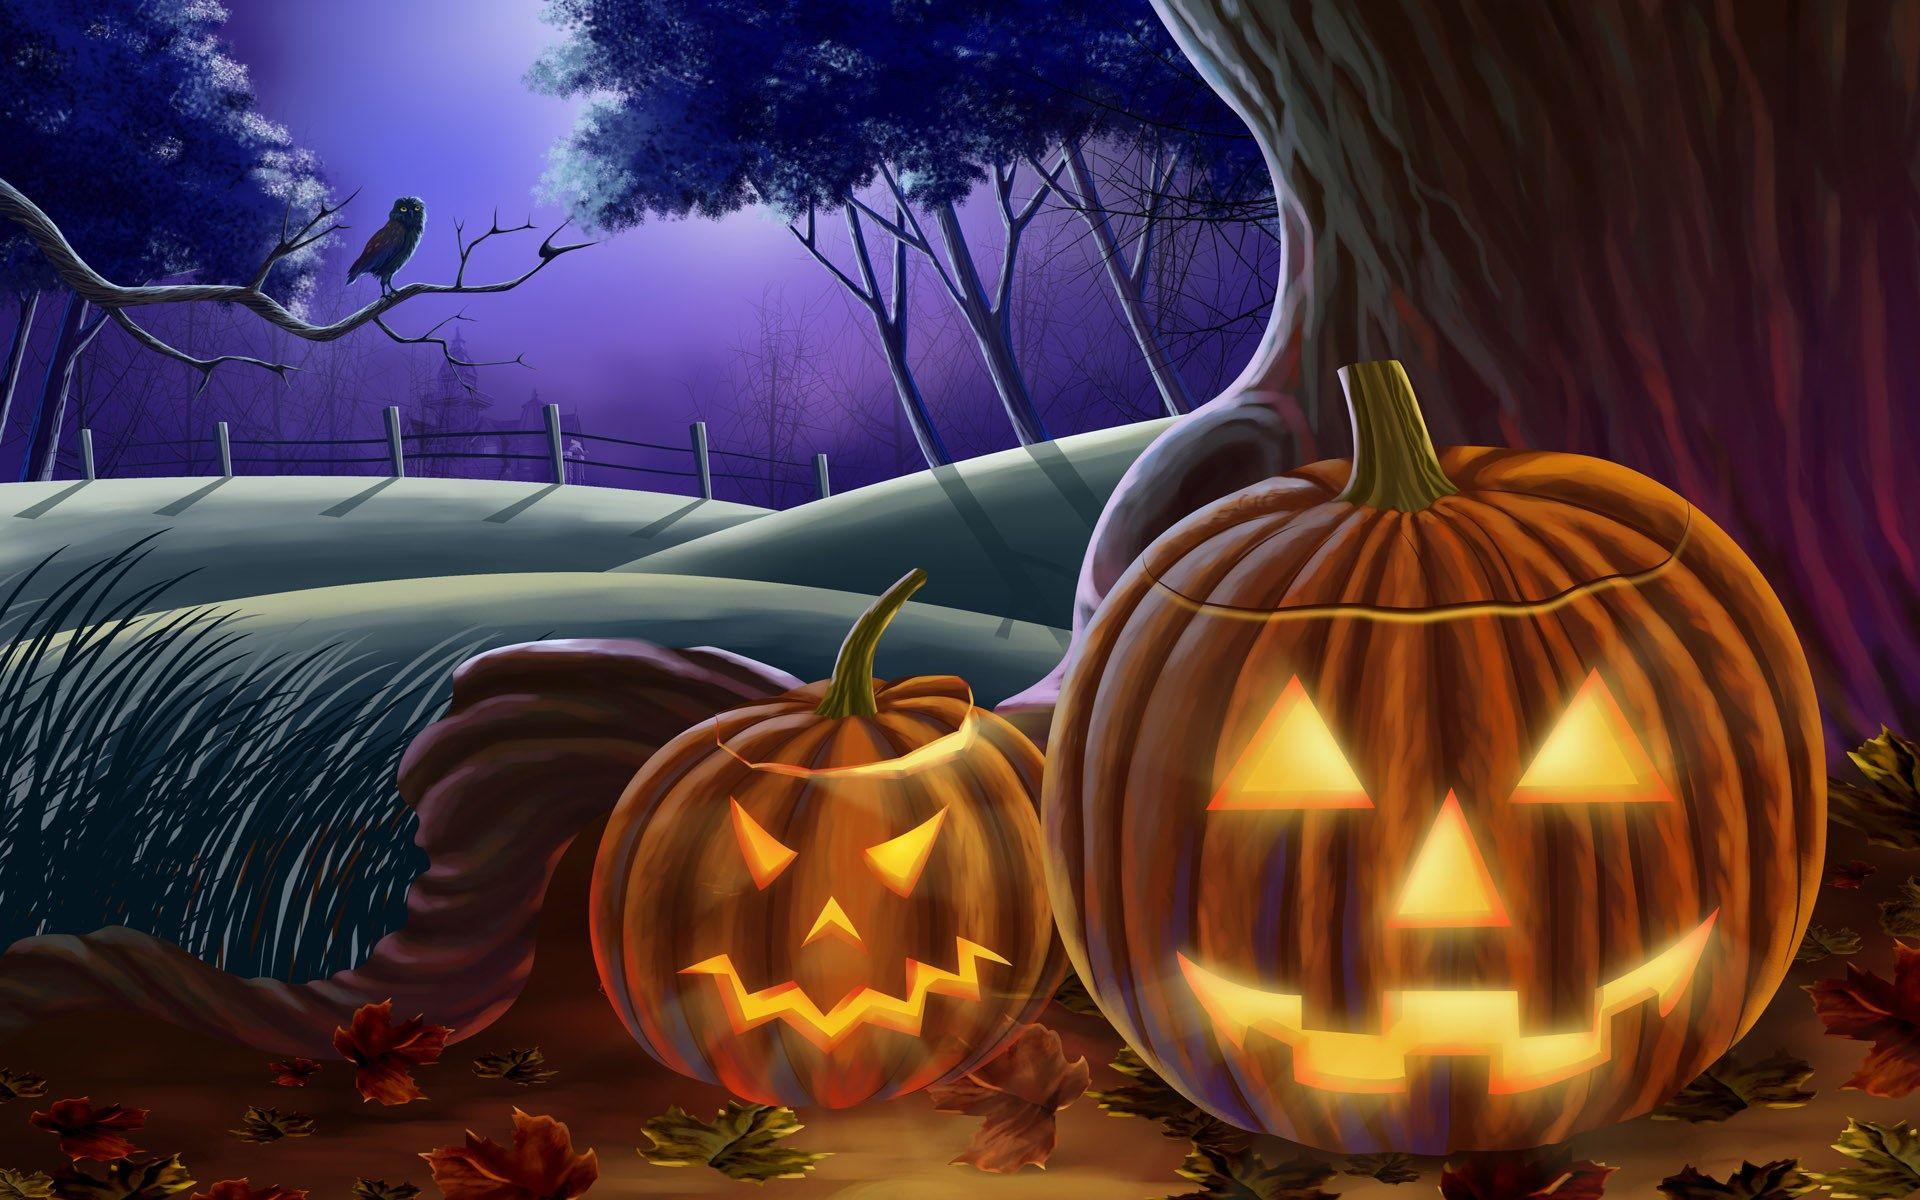 Download Wallpaper Halloween Windows 7 - 4e840bf80f0b7ae1febd2202fb72c09f  Graphic_32239.jpg